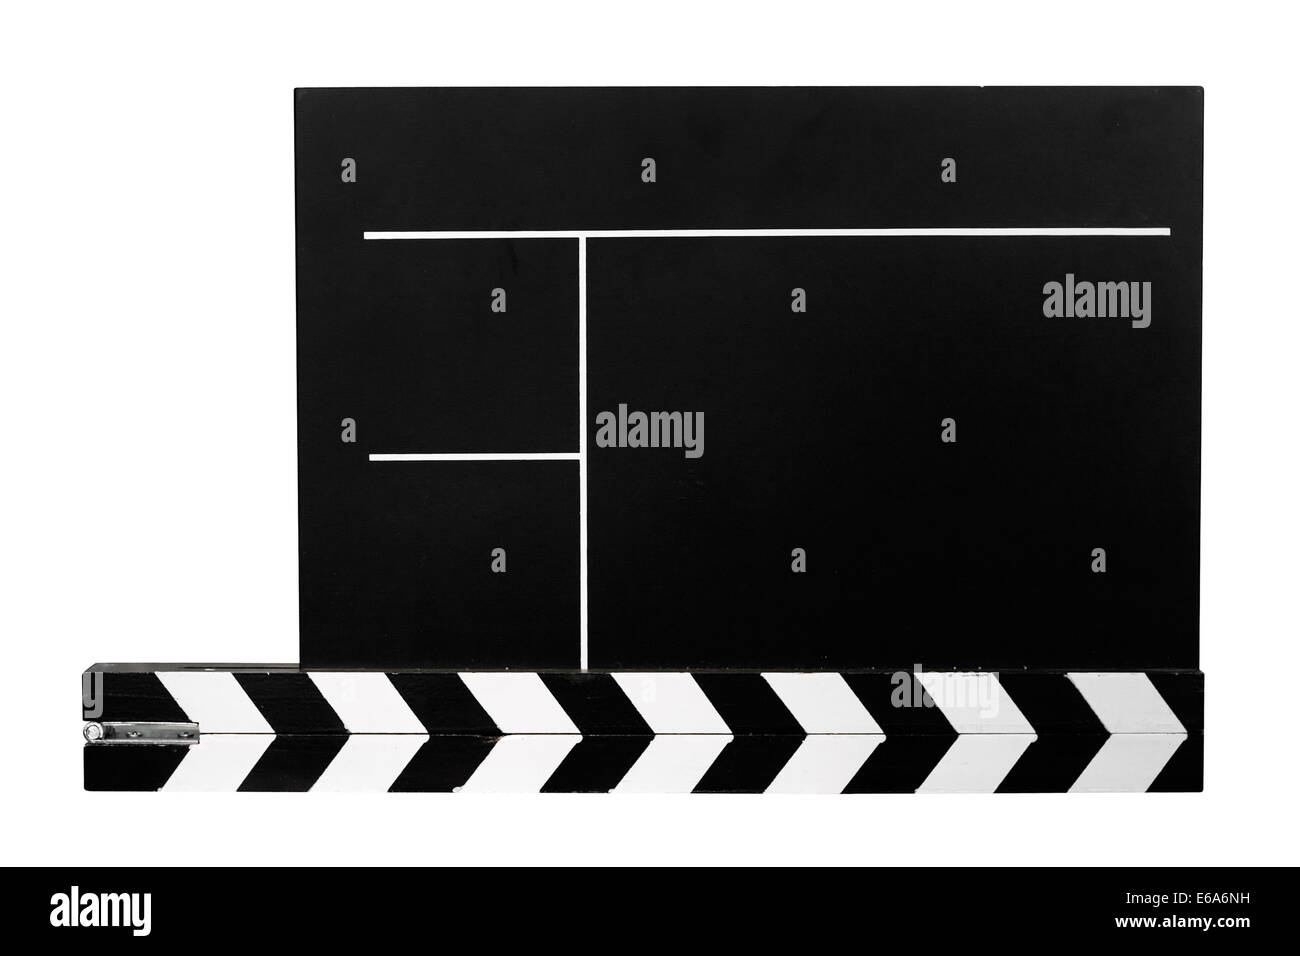 film slate,film industry,film technology - Stock Image